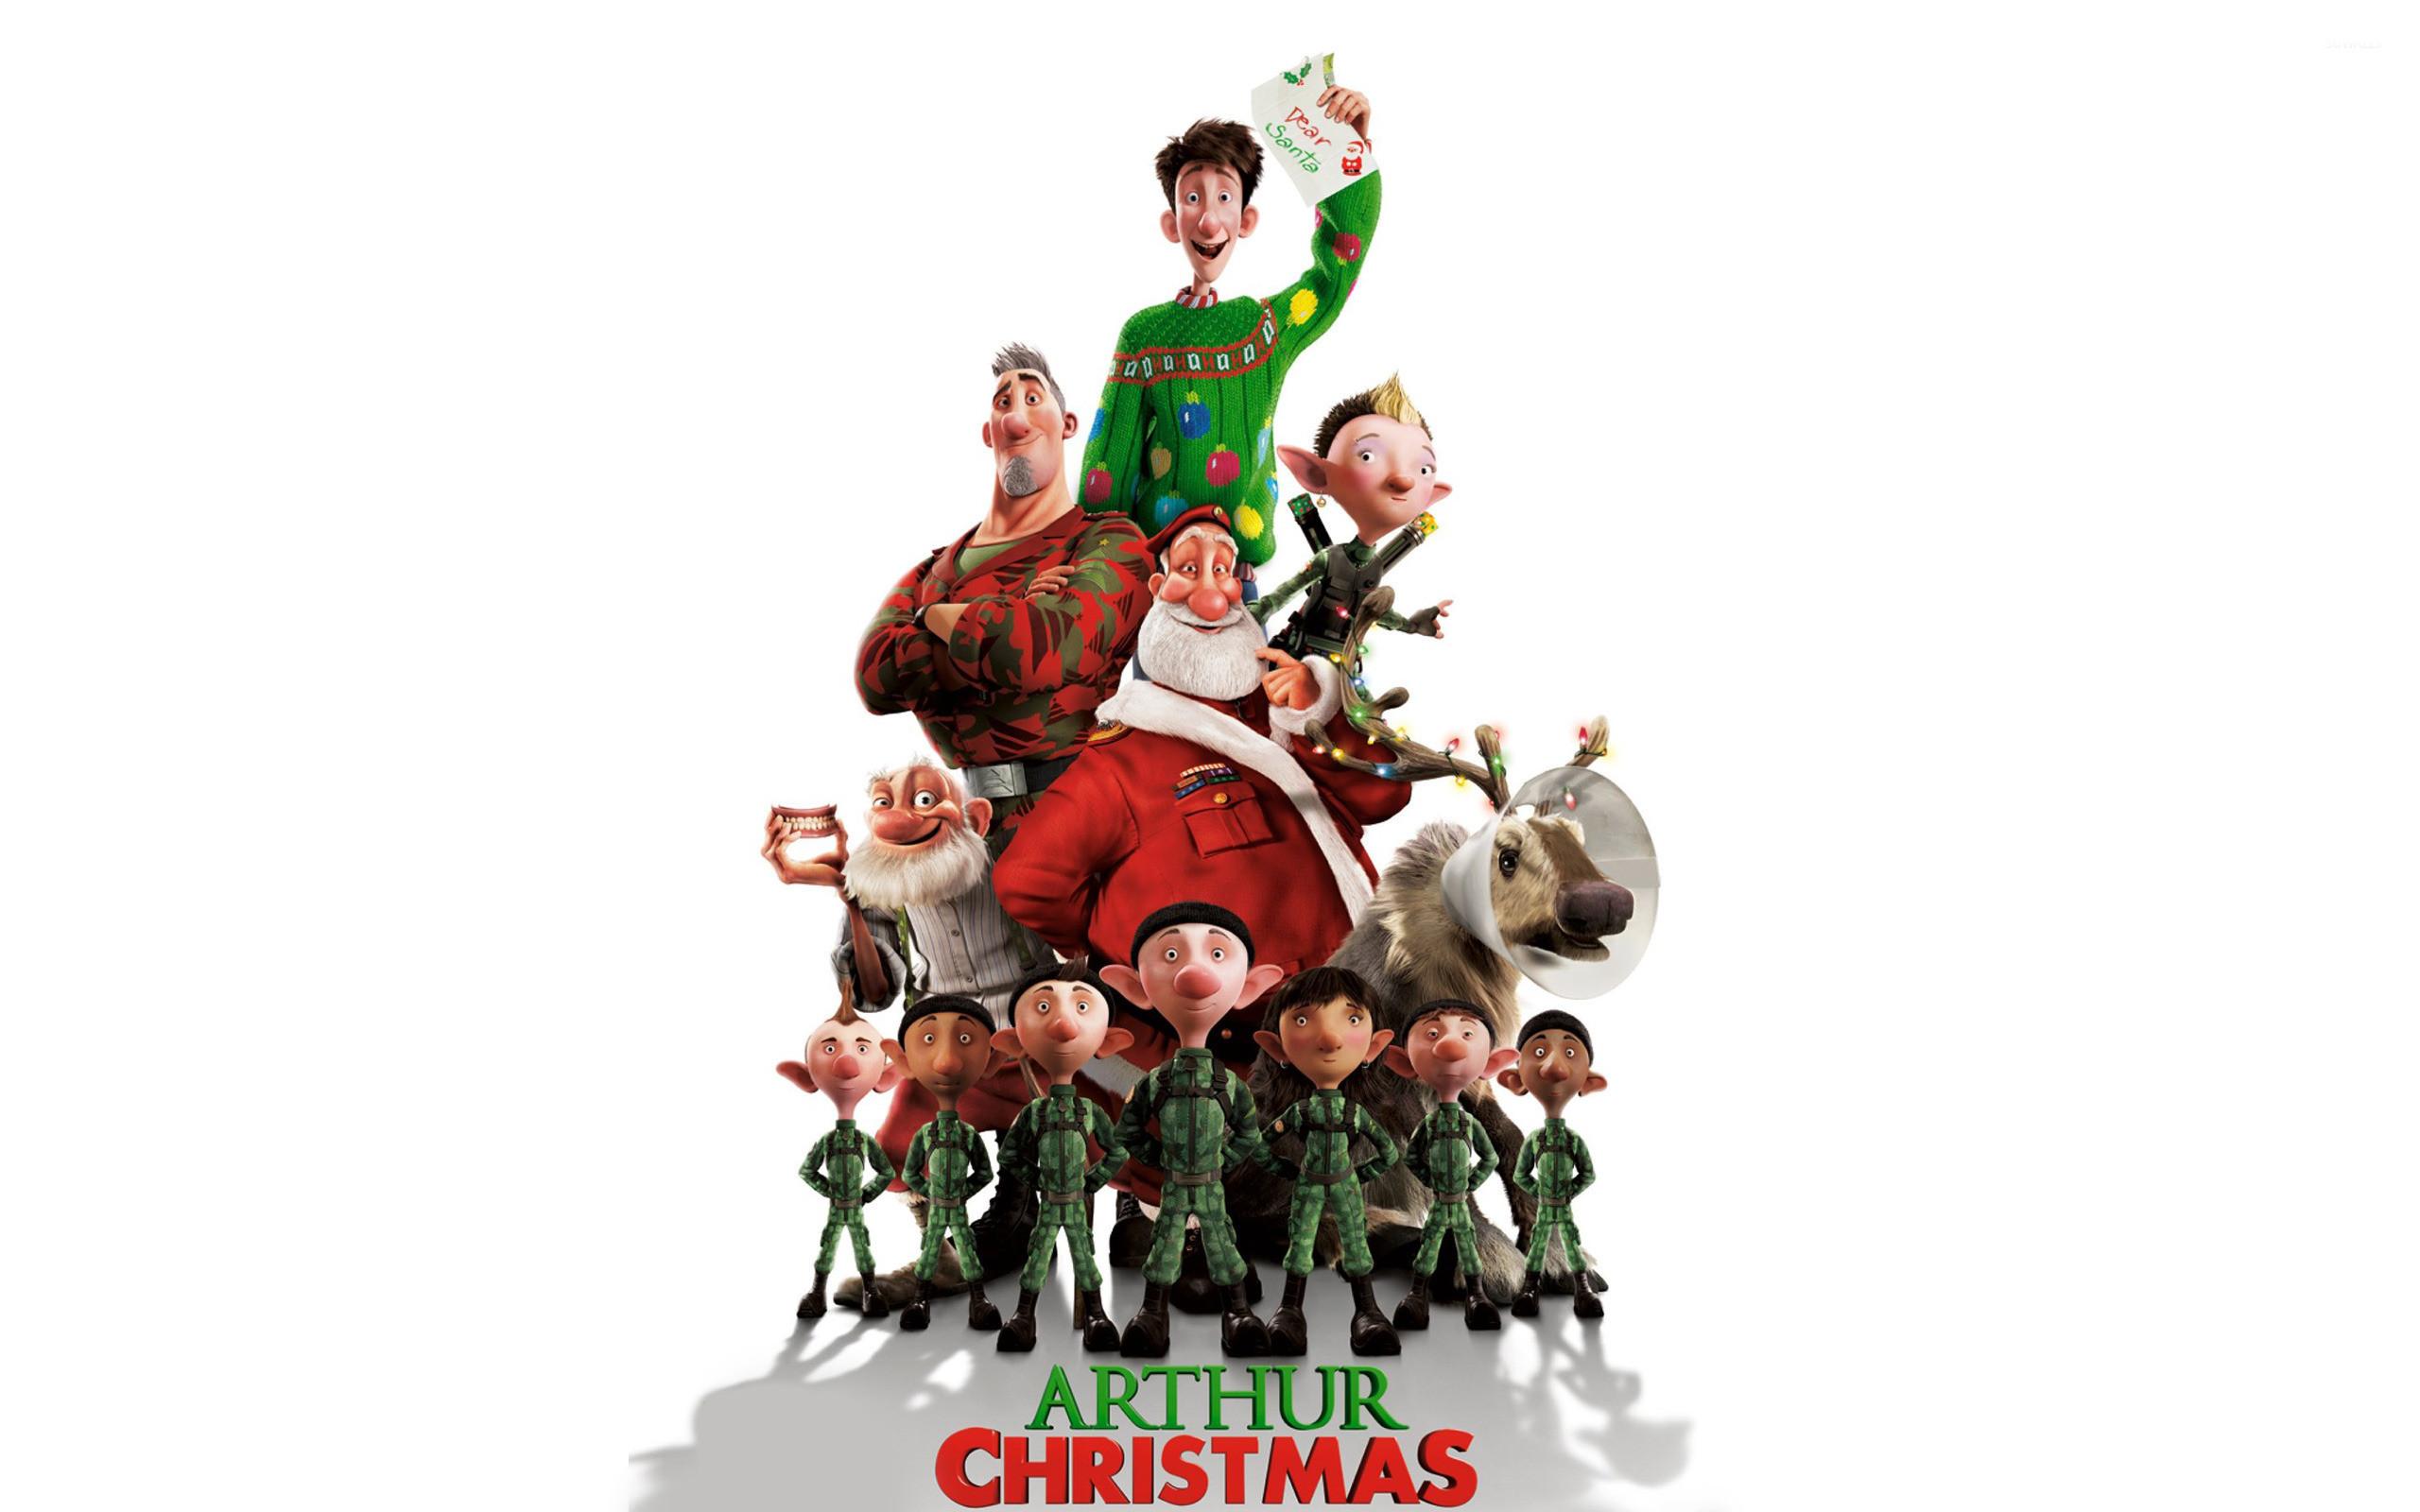 75 Elf Movie Wallpapers on WallpaperPlay 2560x1600